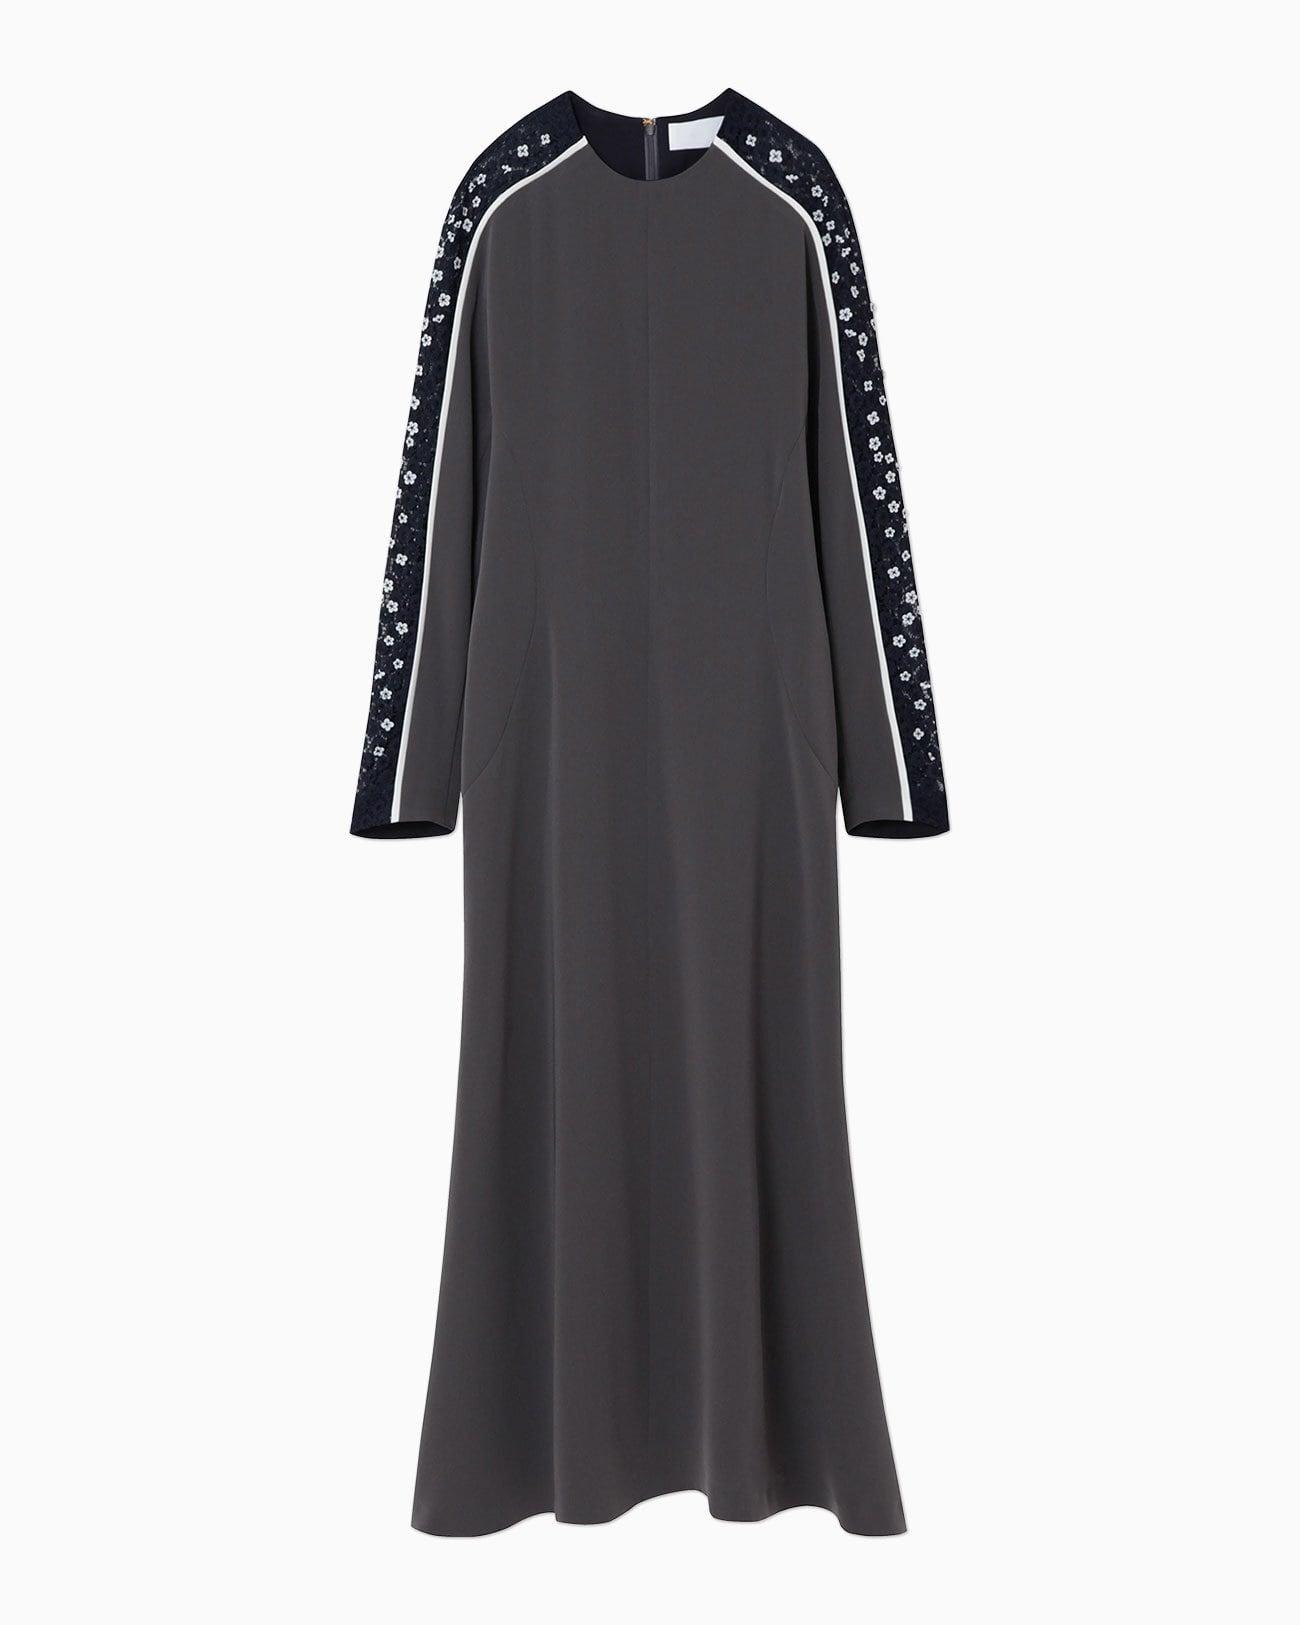 【Mame Kurogouchi】Osmanthus Motif Embroidery Dress  MM21FW-DR038